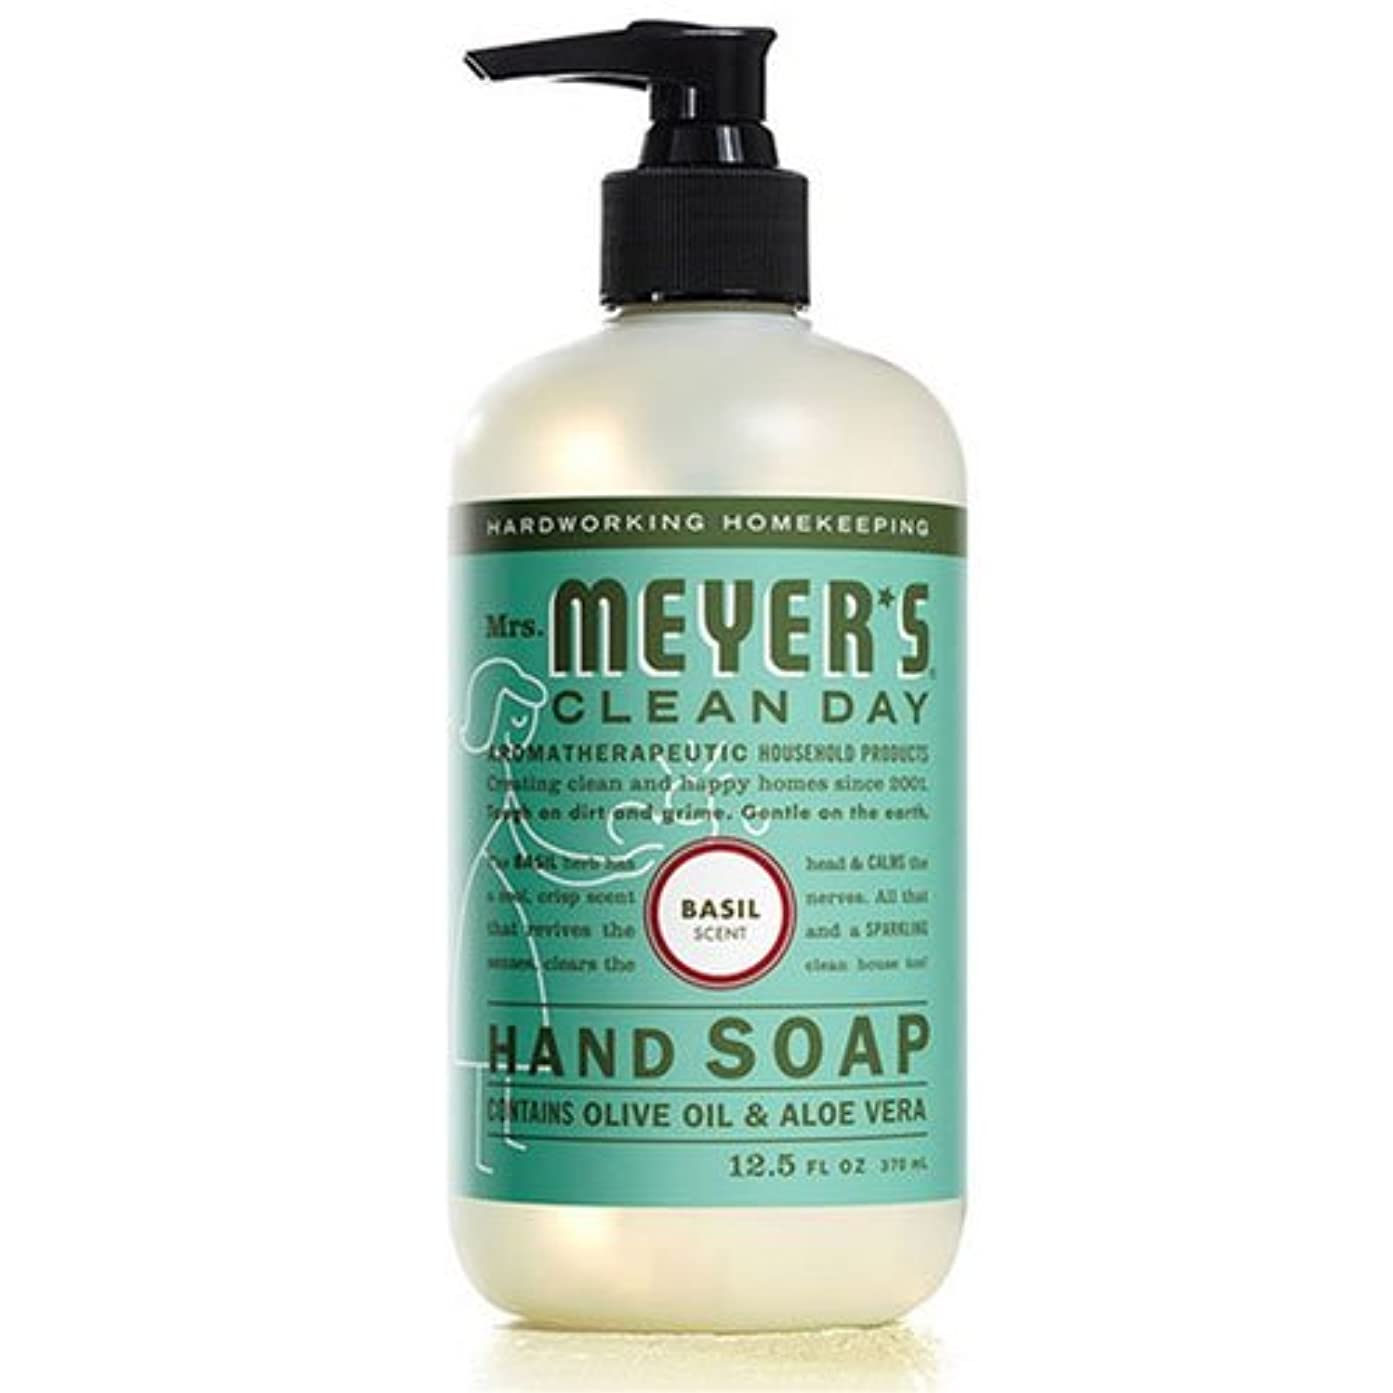 裏切り大胆不敵無実Mrs. Meyers's Hand Soap, Liq, Basil, 12.5 FZ by Mrs. Meyers